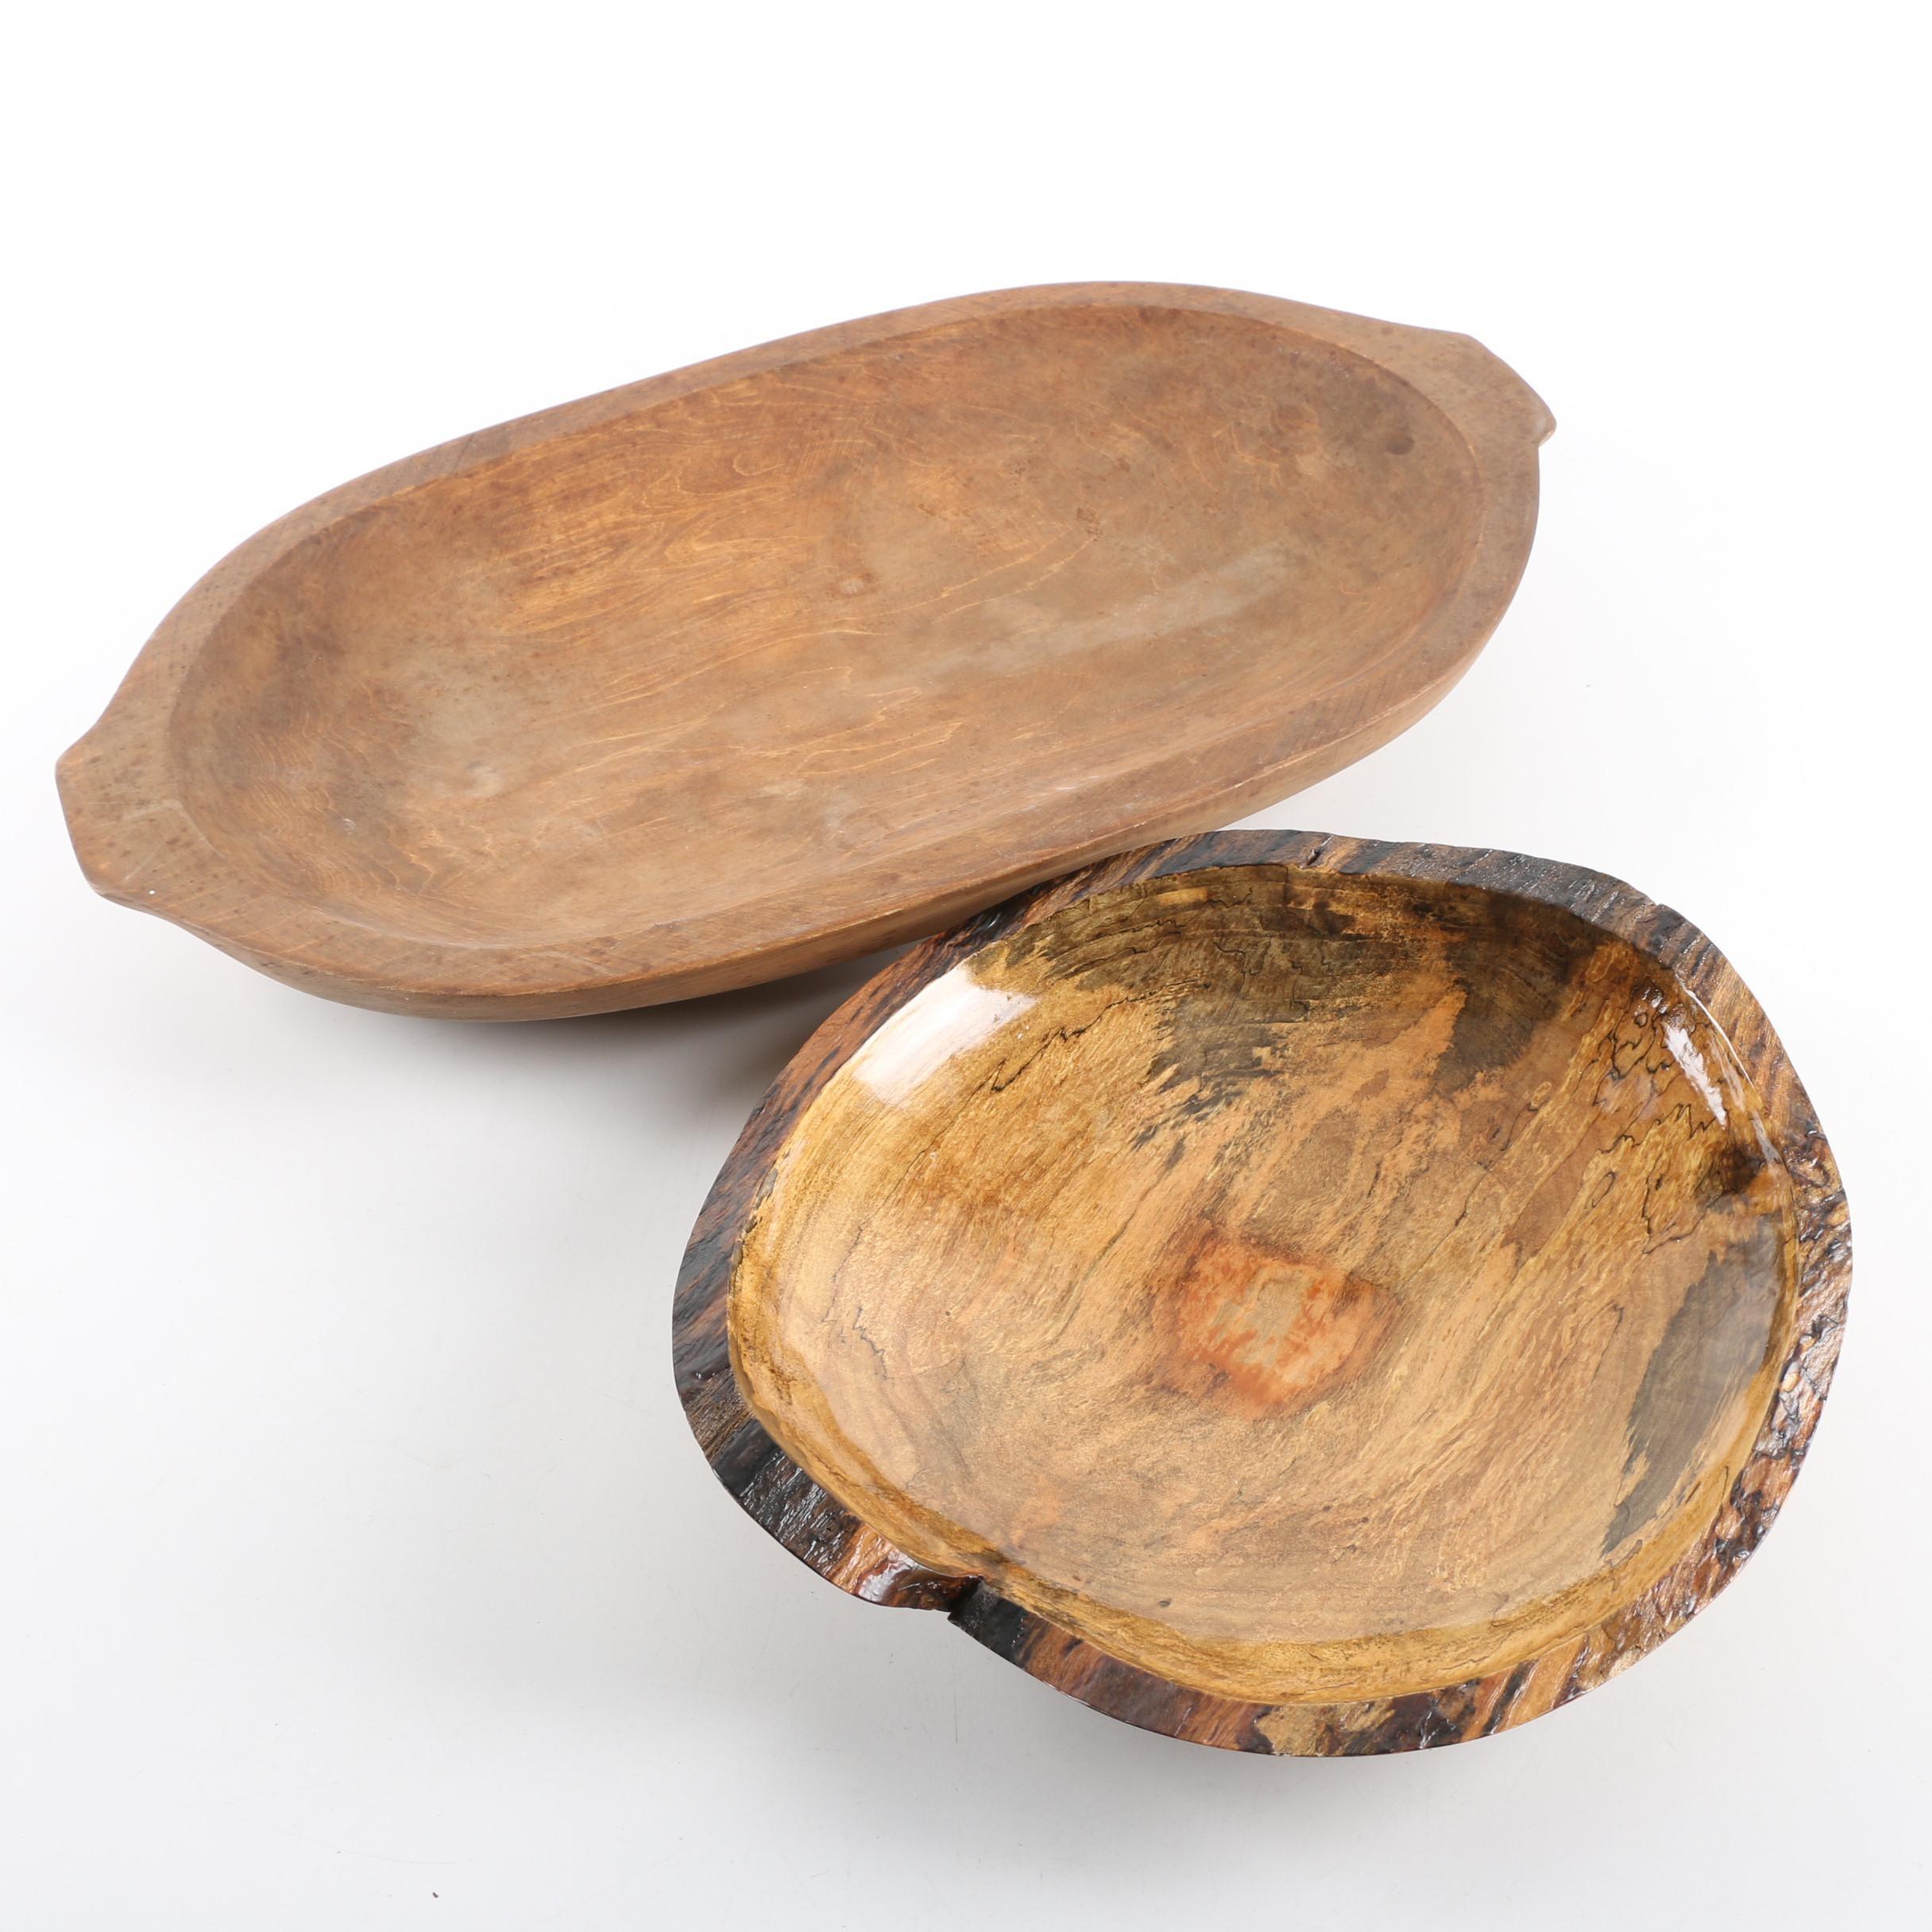 Douglas Richard Swamp Maple Bowl with Wood Dough Bowl